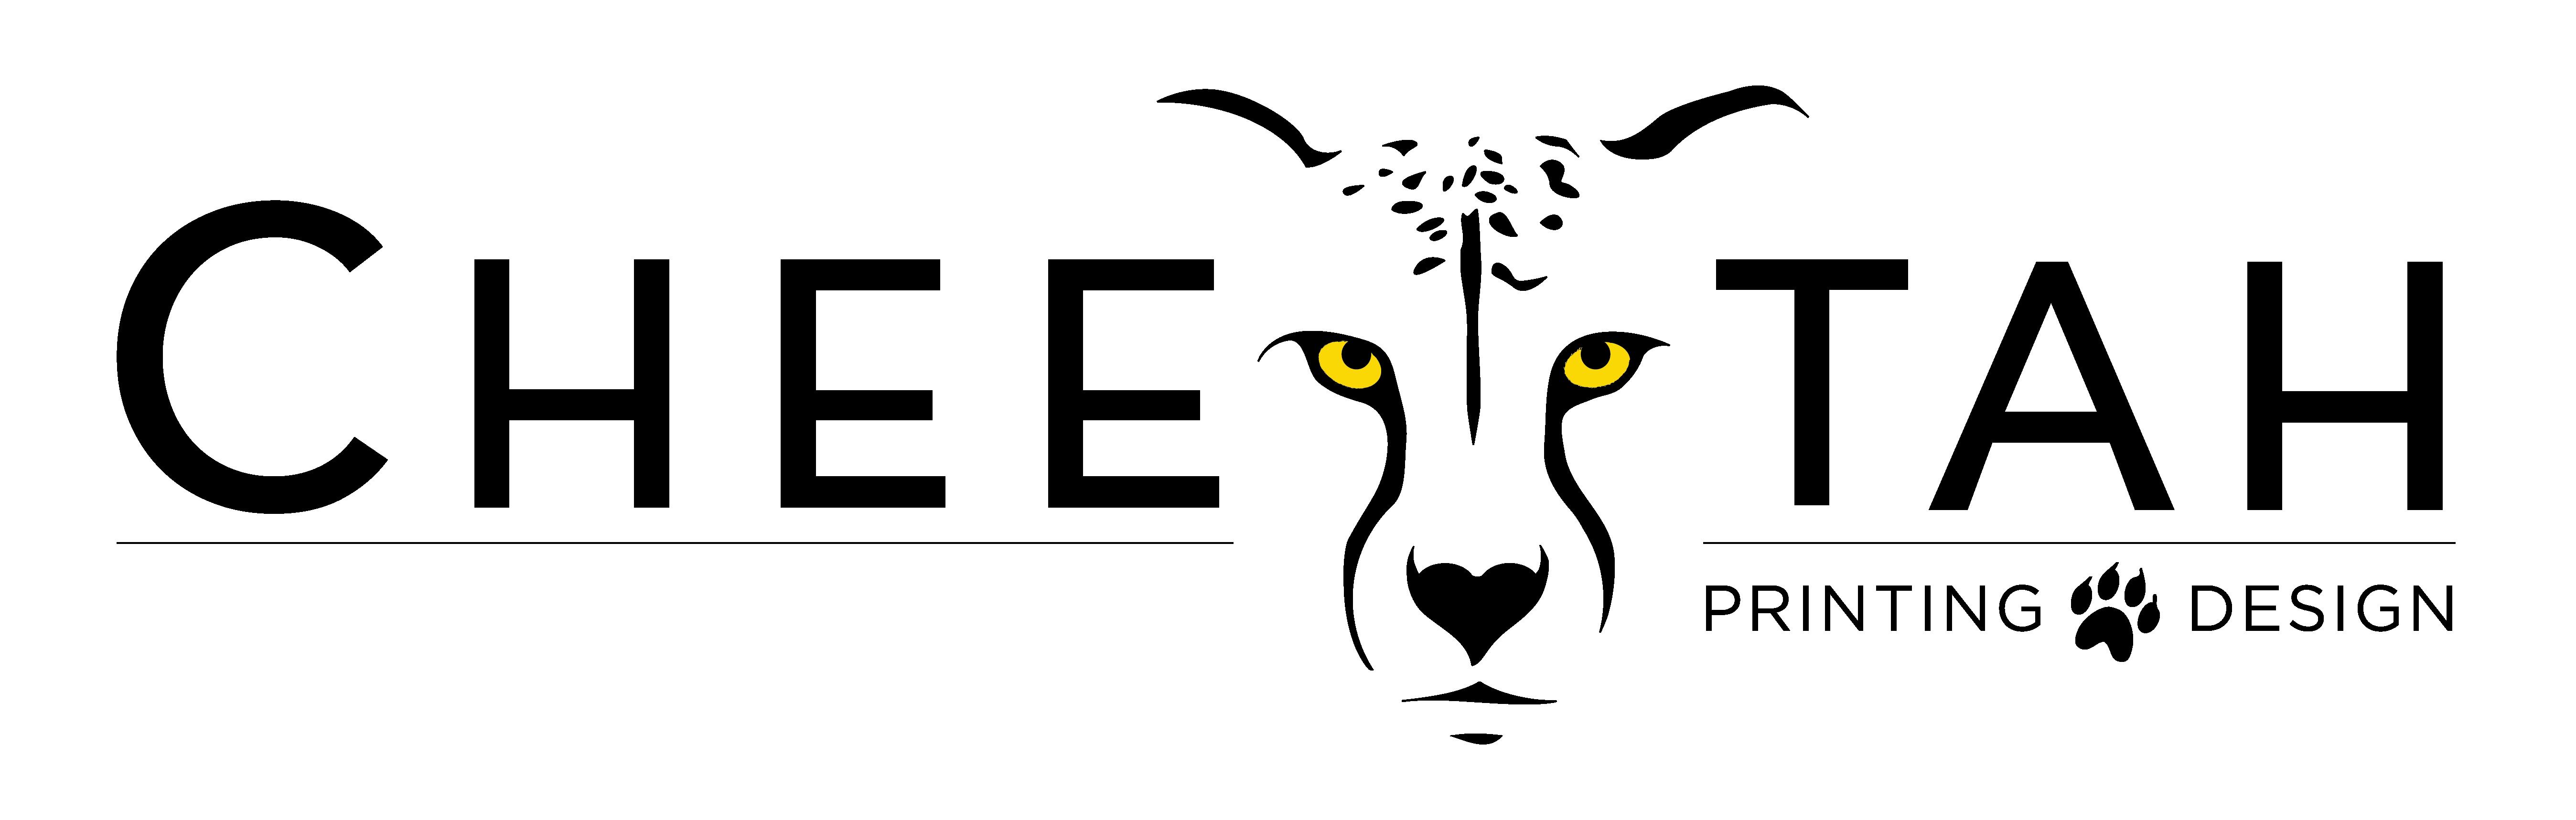 Cheetah Printing Logo